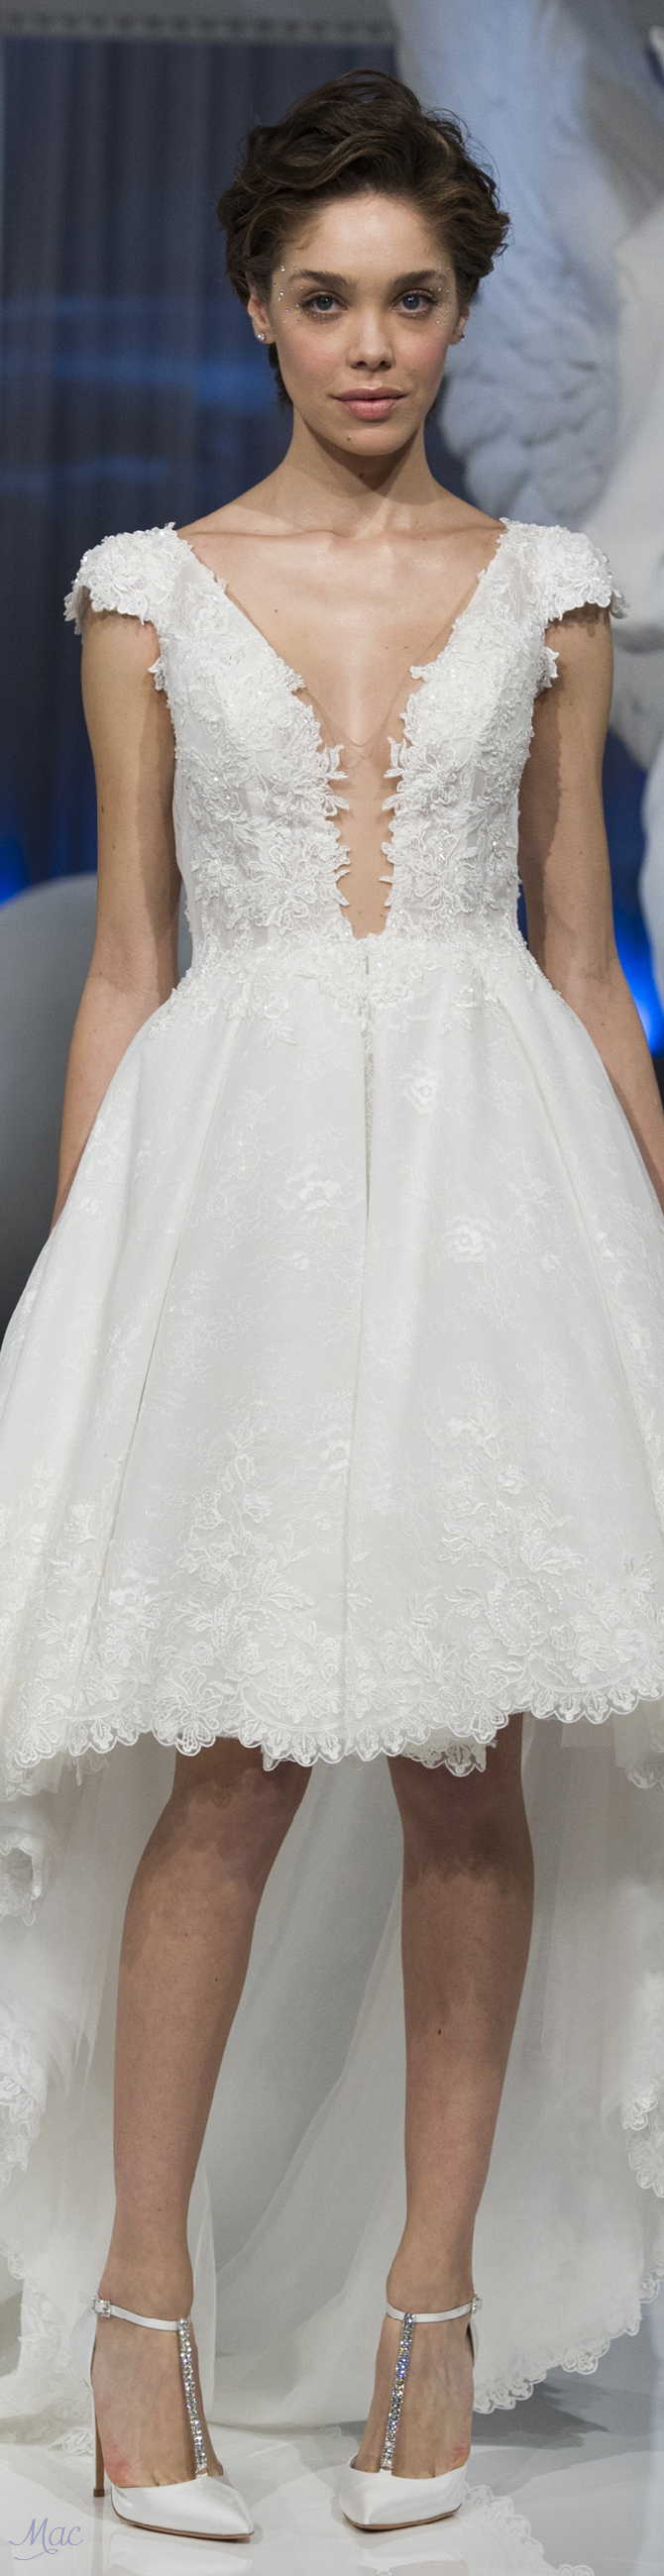 Spring bridal nicole bridal gowns pinterest spring